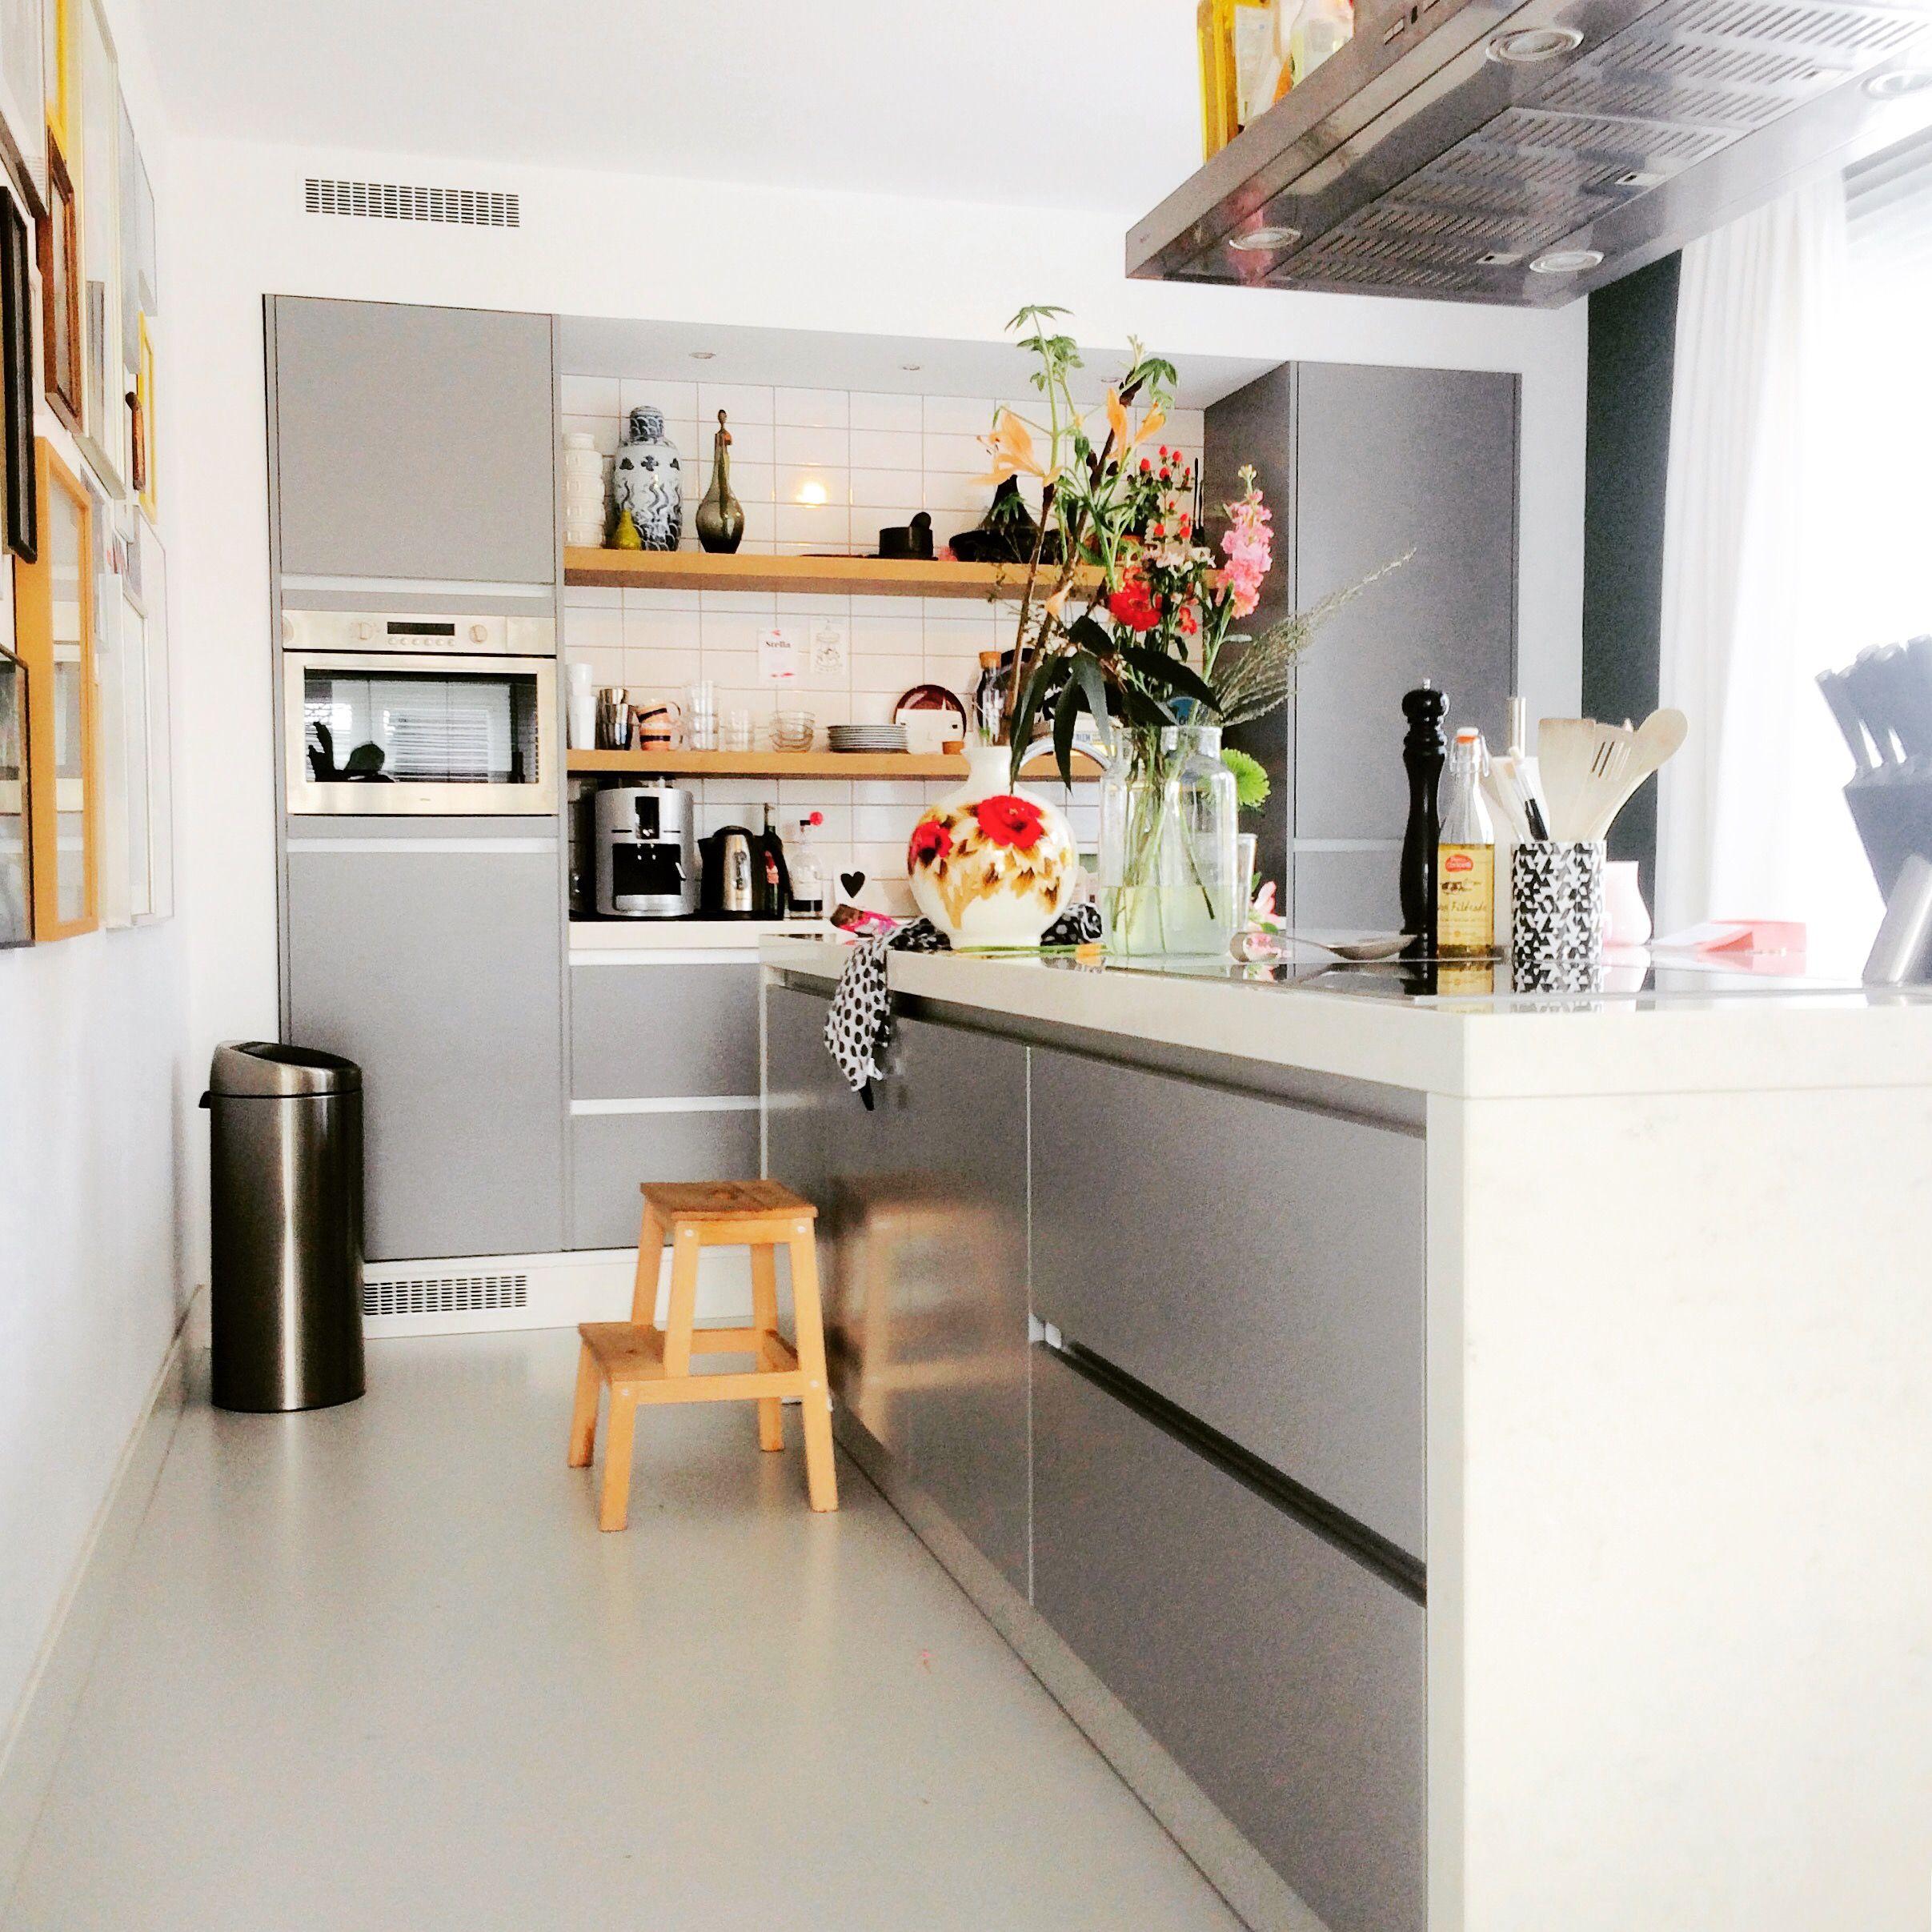 @Lindastijlvast #Interior #Interiordesign #Styling #Stijlvast #Interiorstyling